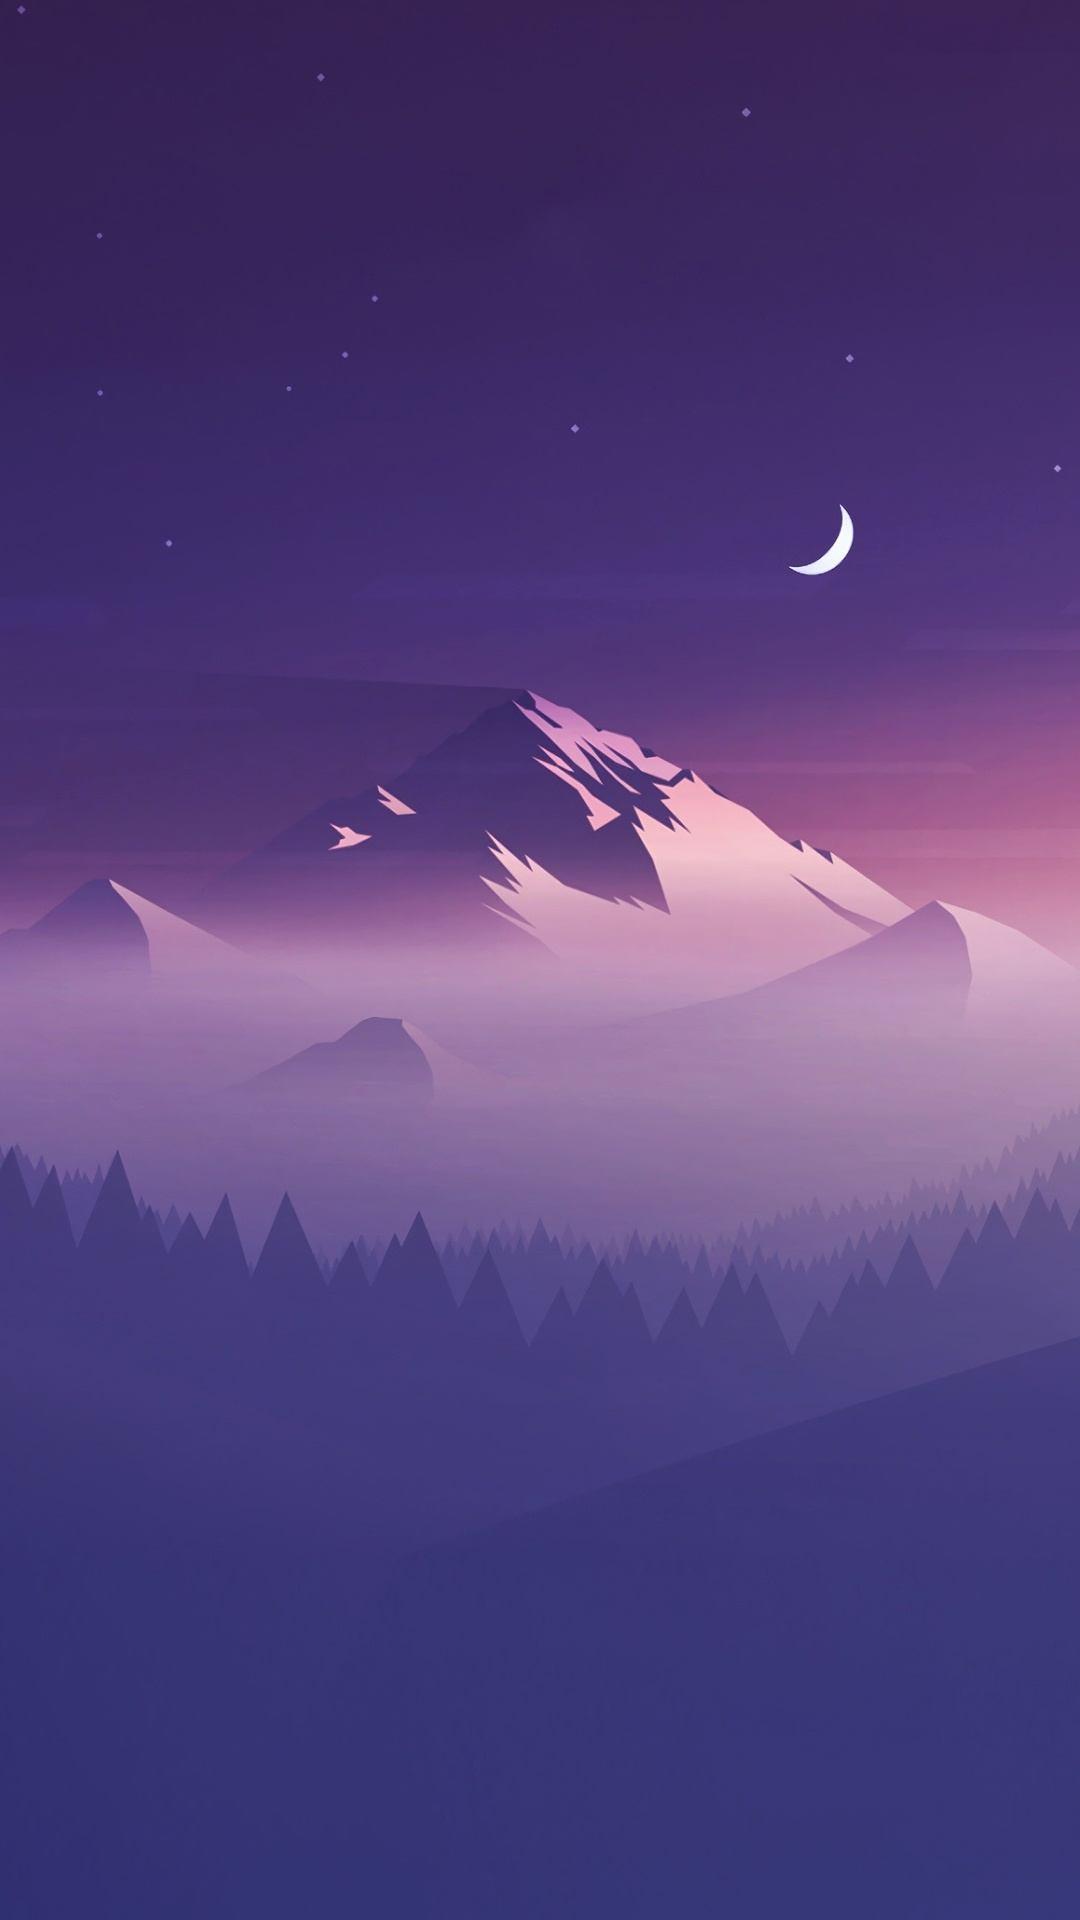 mountains minimalists 4k vx 1080x1920 - Pack de Fondos de Pantalla de Montañas